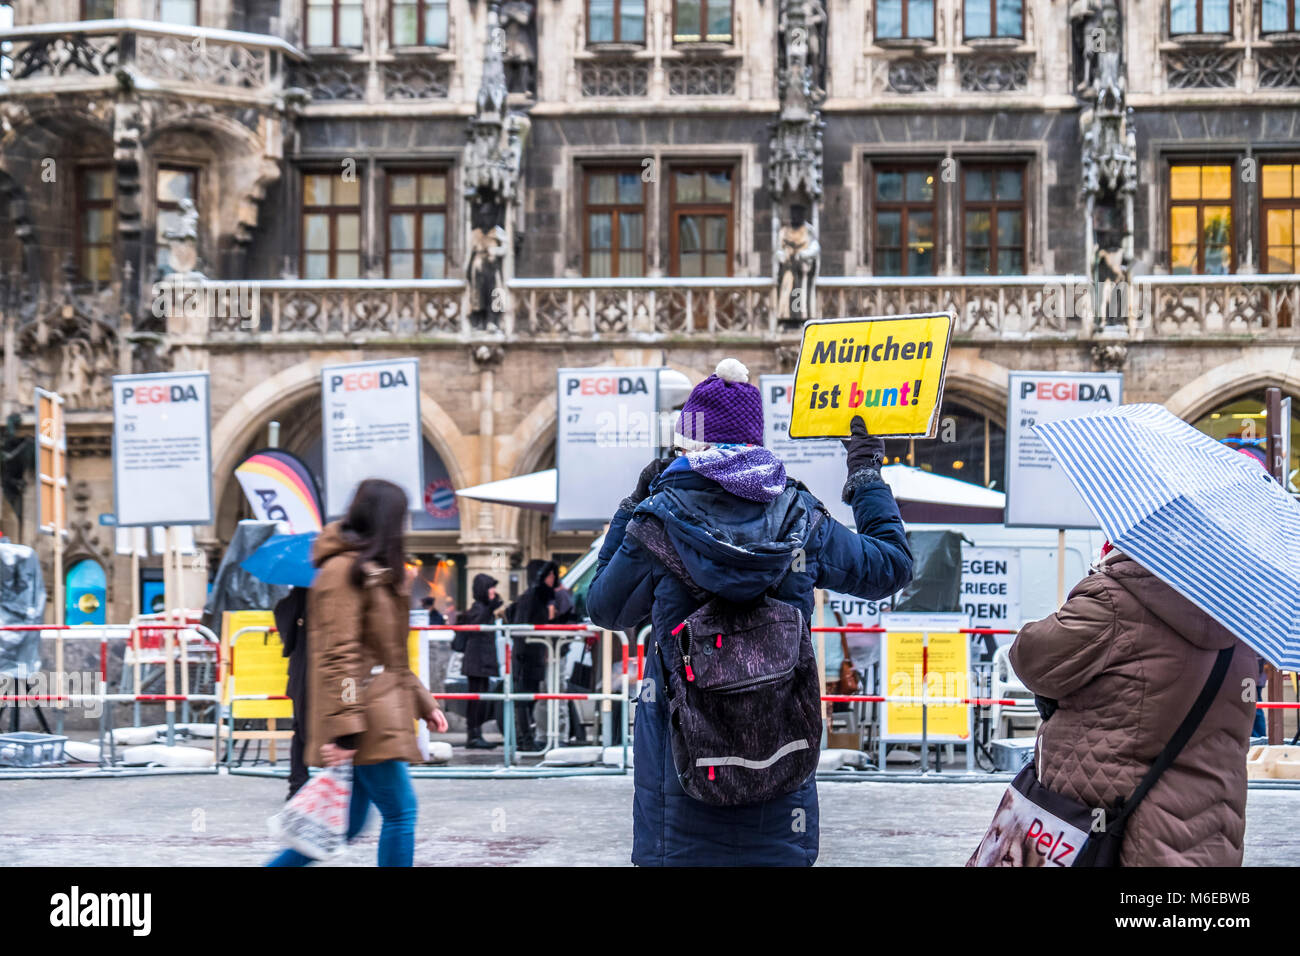 MUNICH / GERMANY - FEBRUARY 15 2018: Lady is raising a sign against the PEGIDA demonstration, Translation: Munich - Stock Image